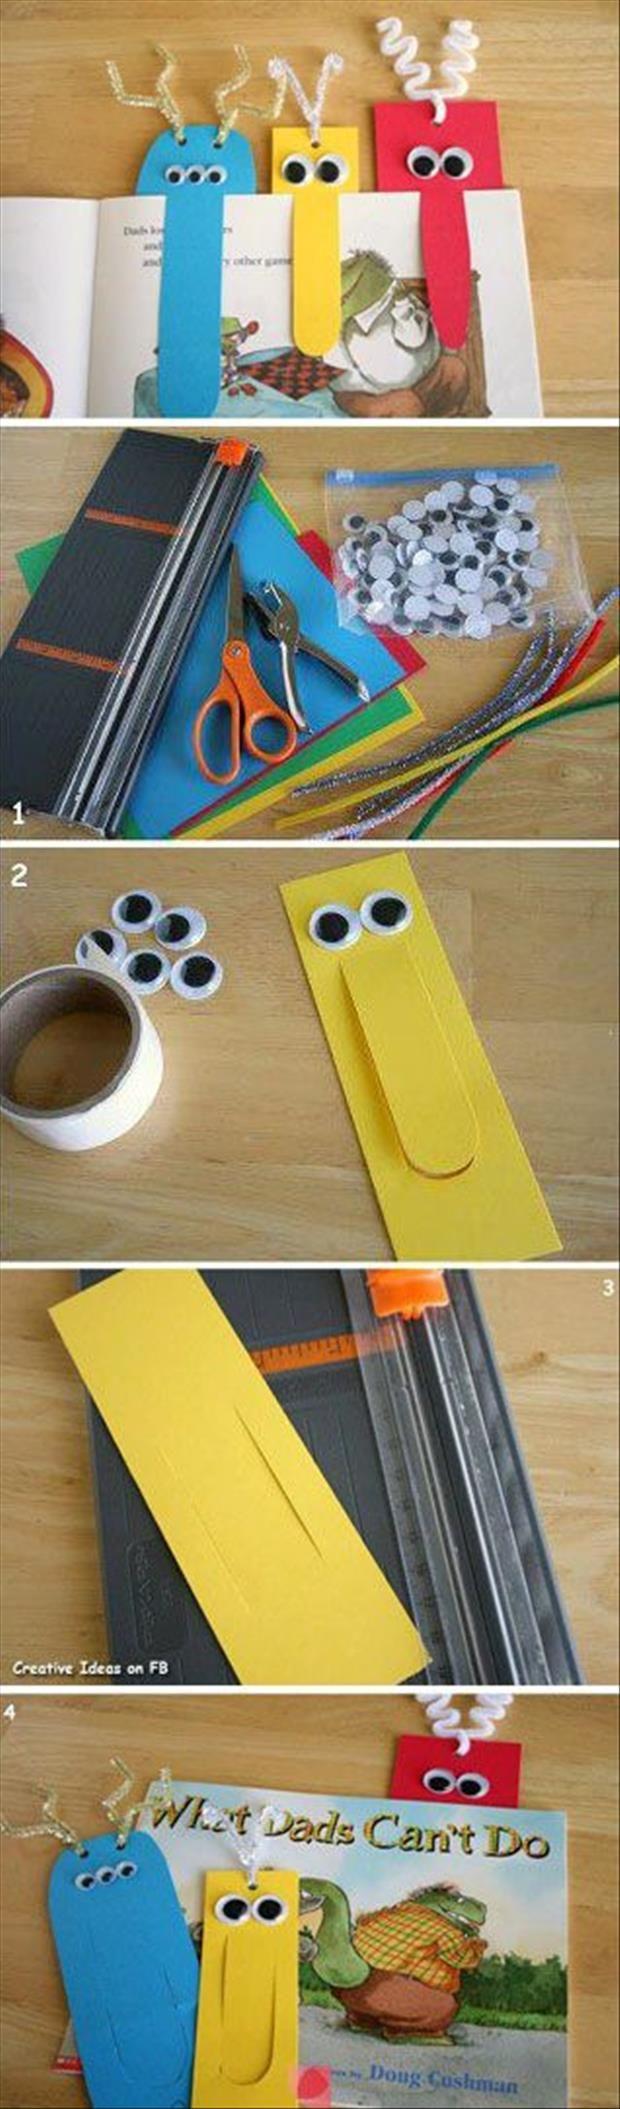 Fun do it yourself craft ideas 31 pics craft bookmarks and fun fun do it yourself craft ideas 31 pics solutioingenieria Images